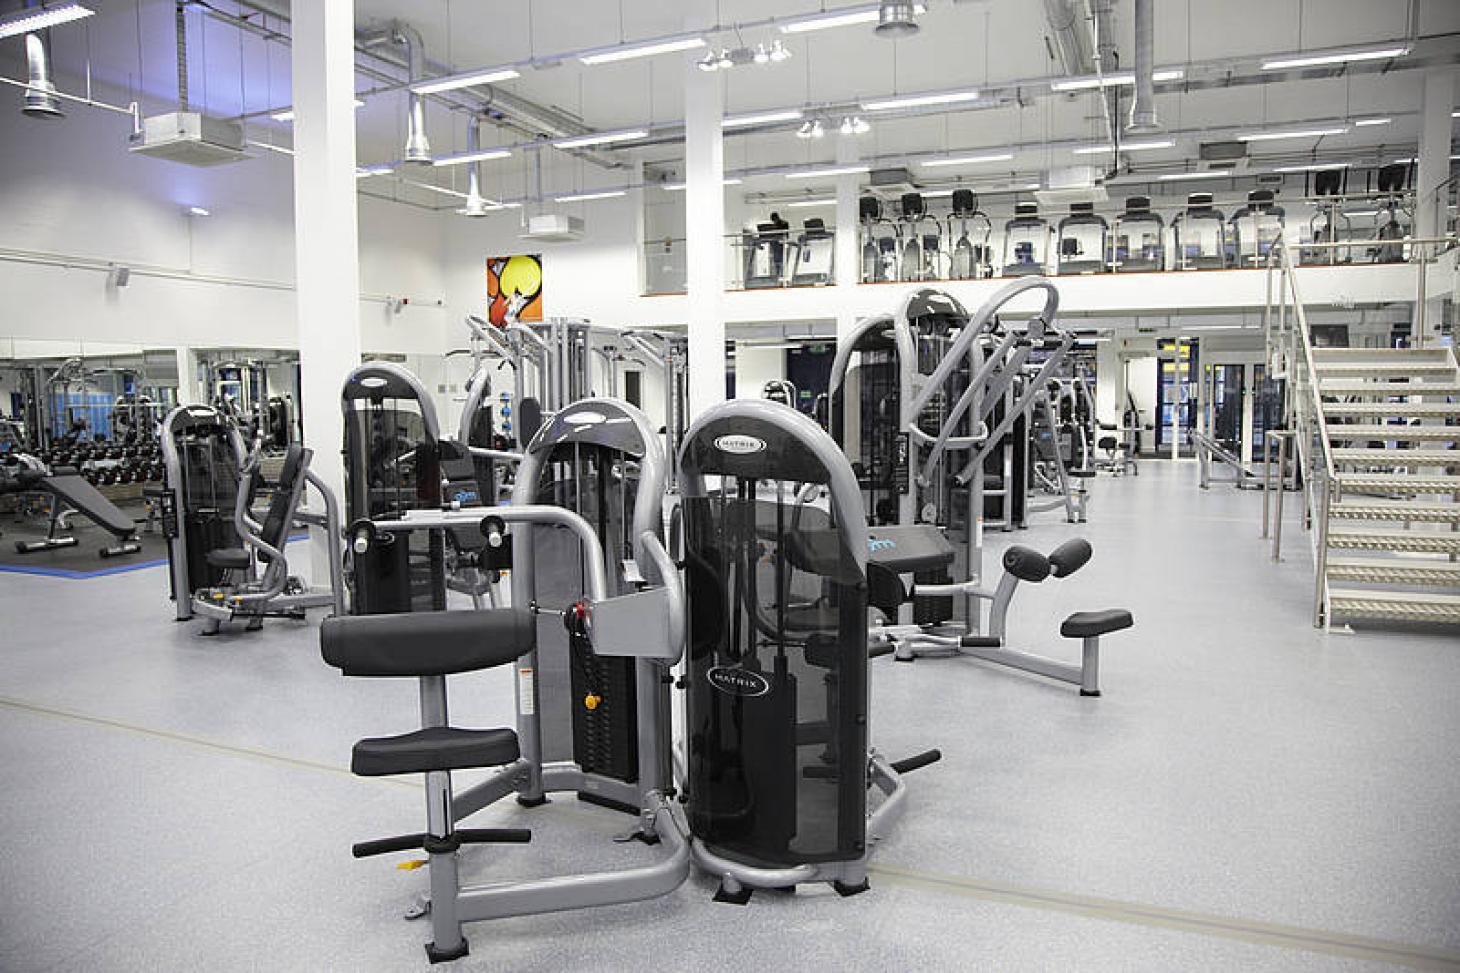 The Gym Luton Gym gym